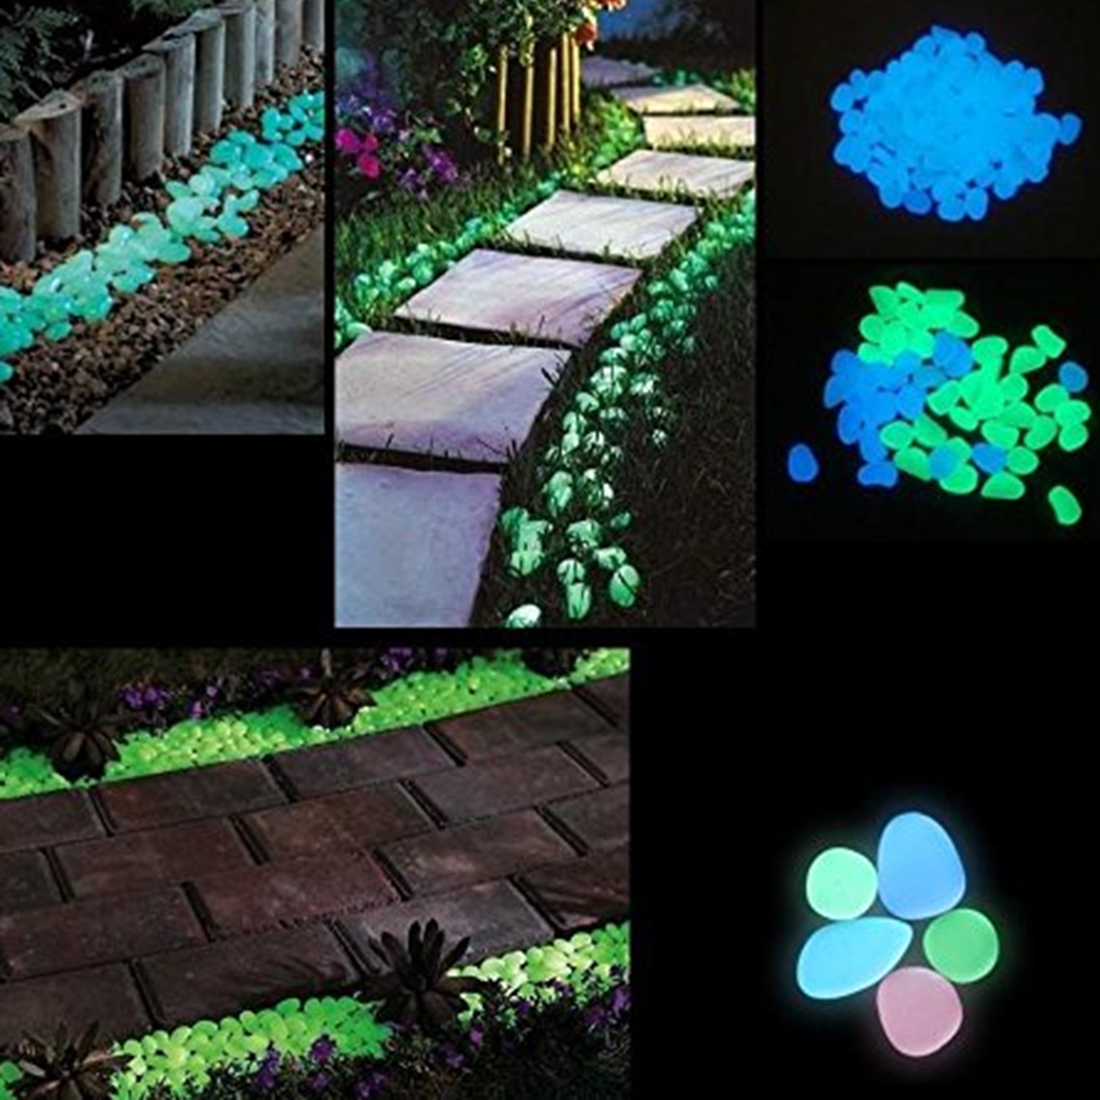 VICTMAX 240Pcs/set Luminous Resin Night Stone Pebble Garden Landscaping Decoration Artificial Cobblestone - Green + Blue White